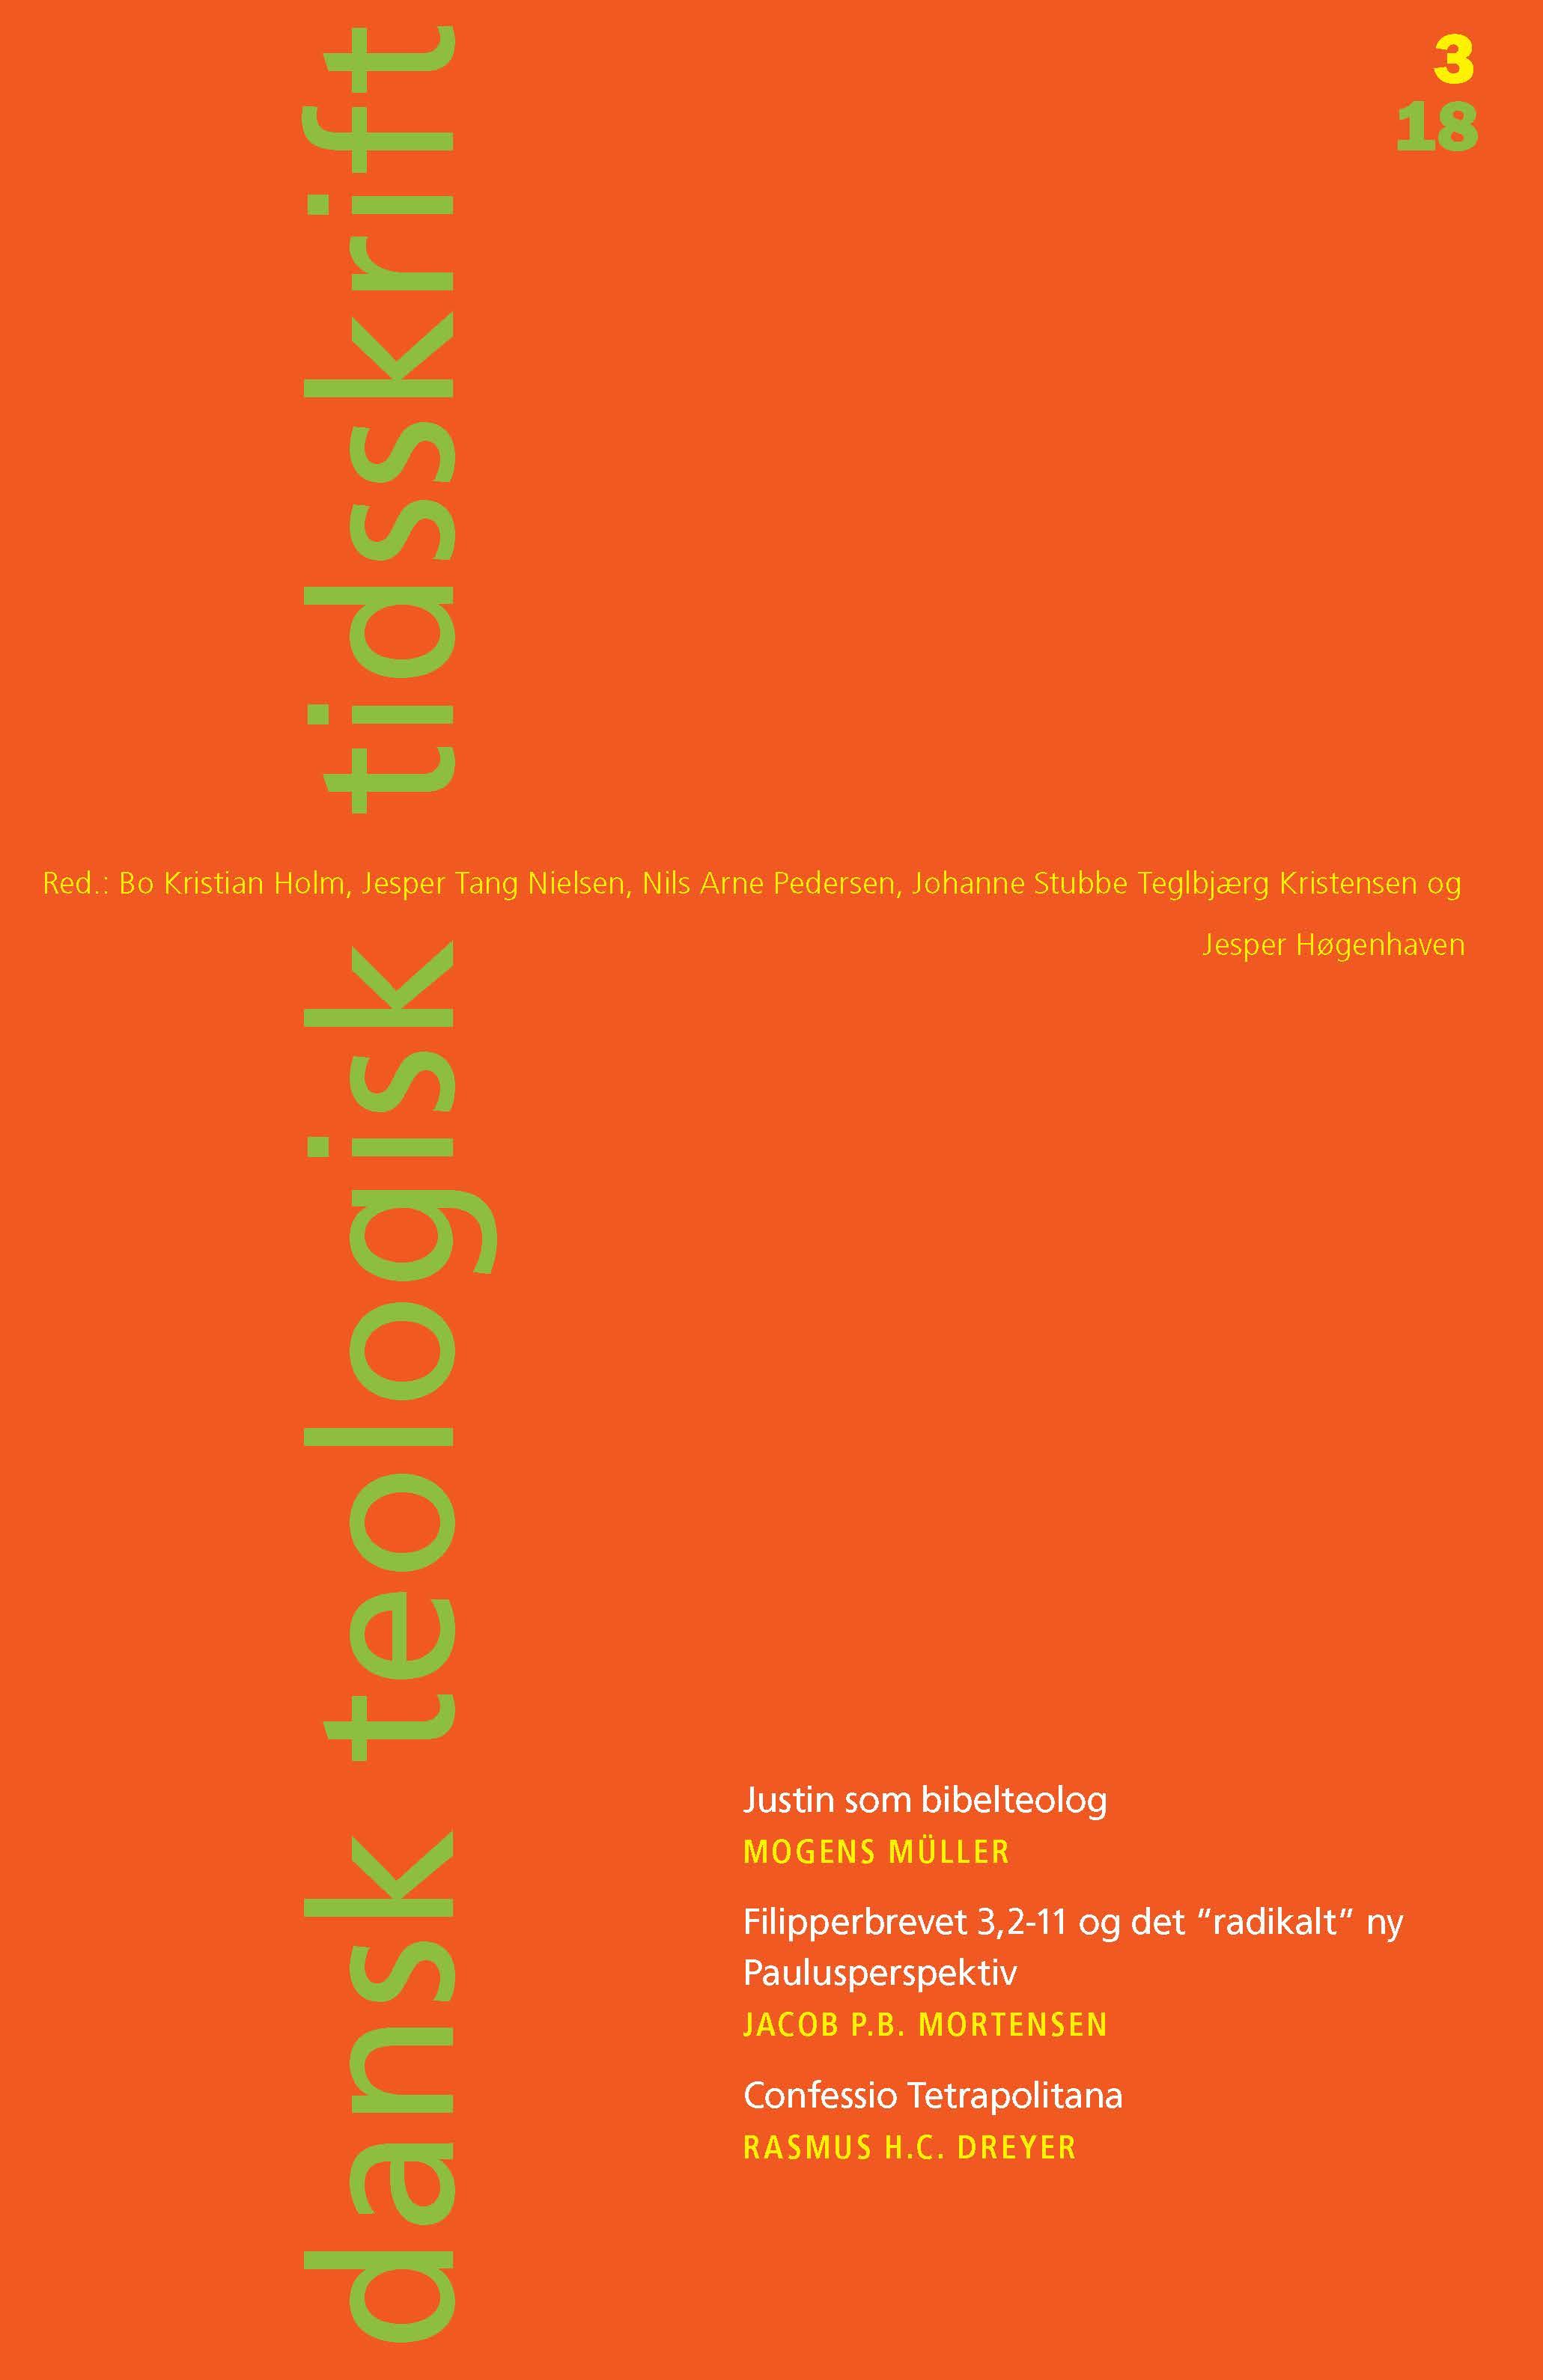 Dansk Teologisk Tidsskrift nr. 3, 2018